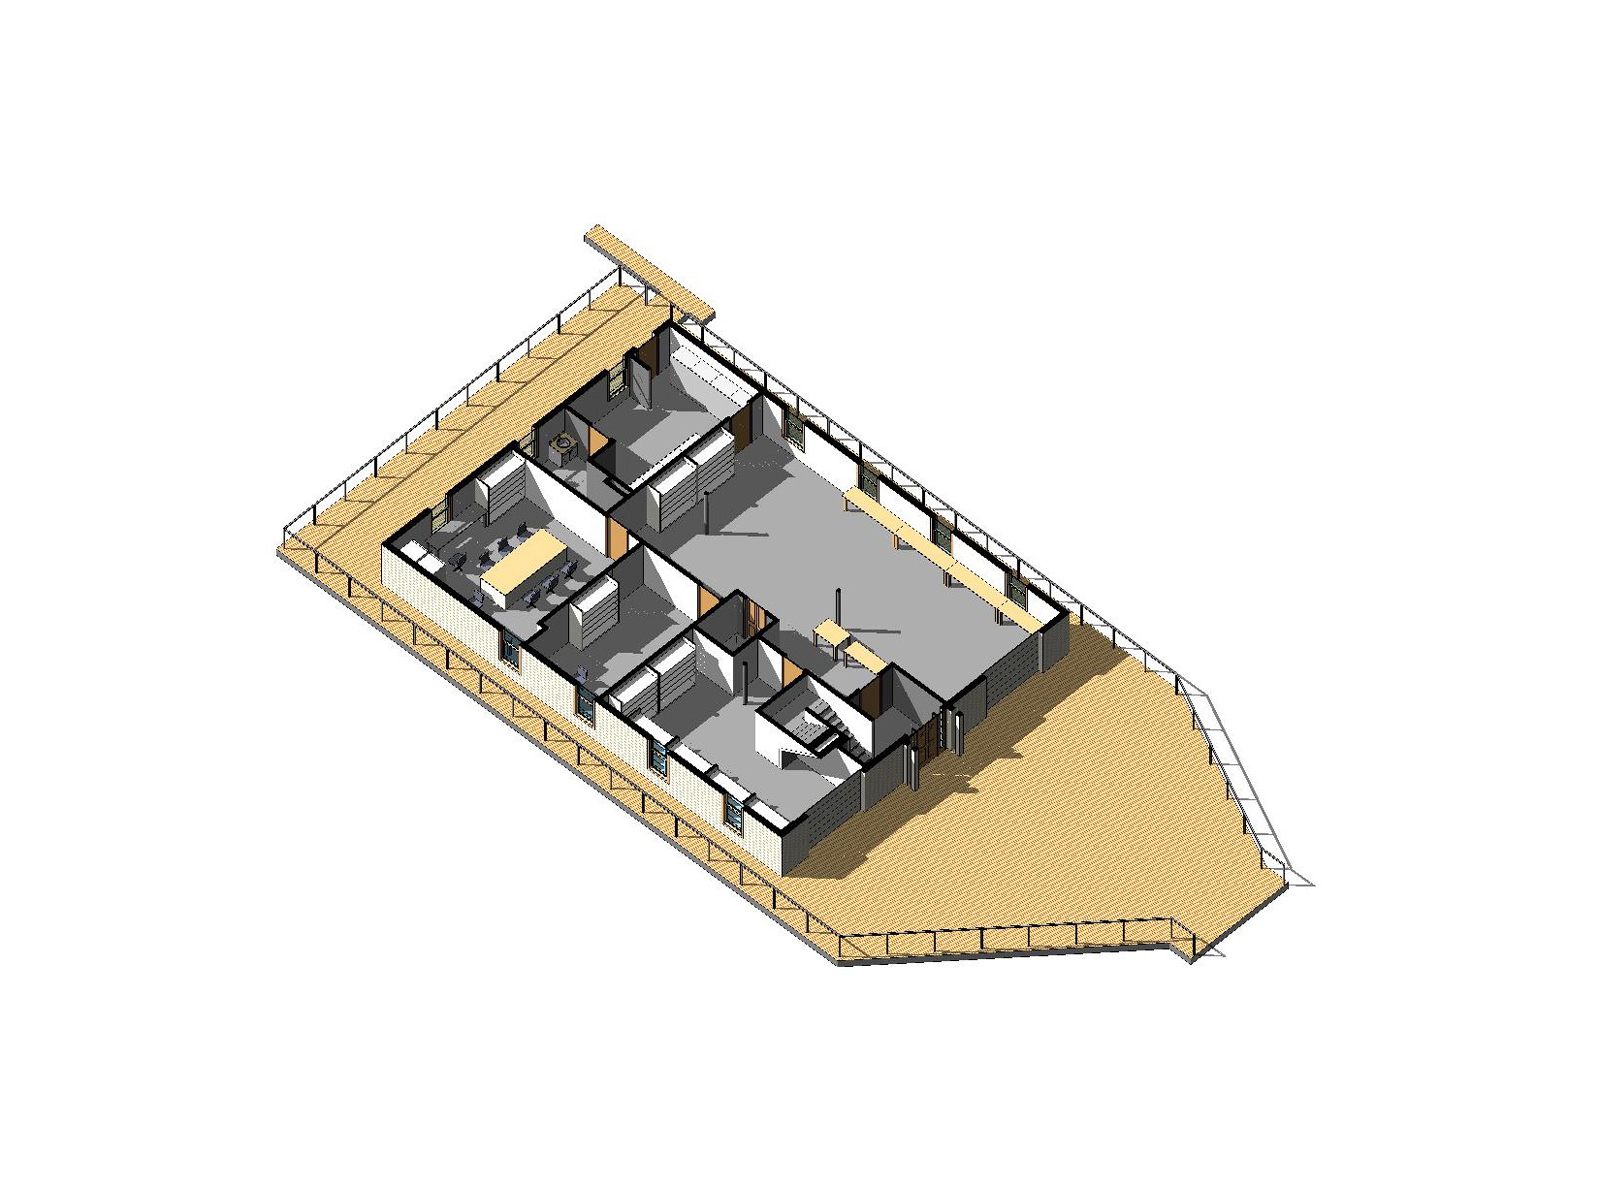 boathouse_isometric-01e.jpg